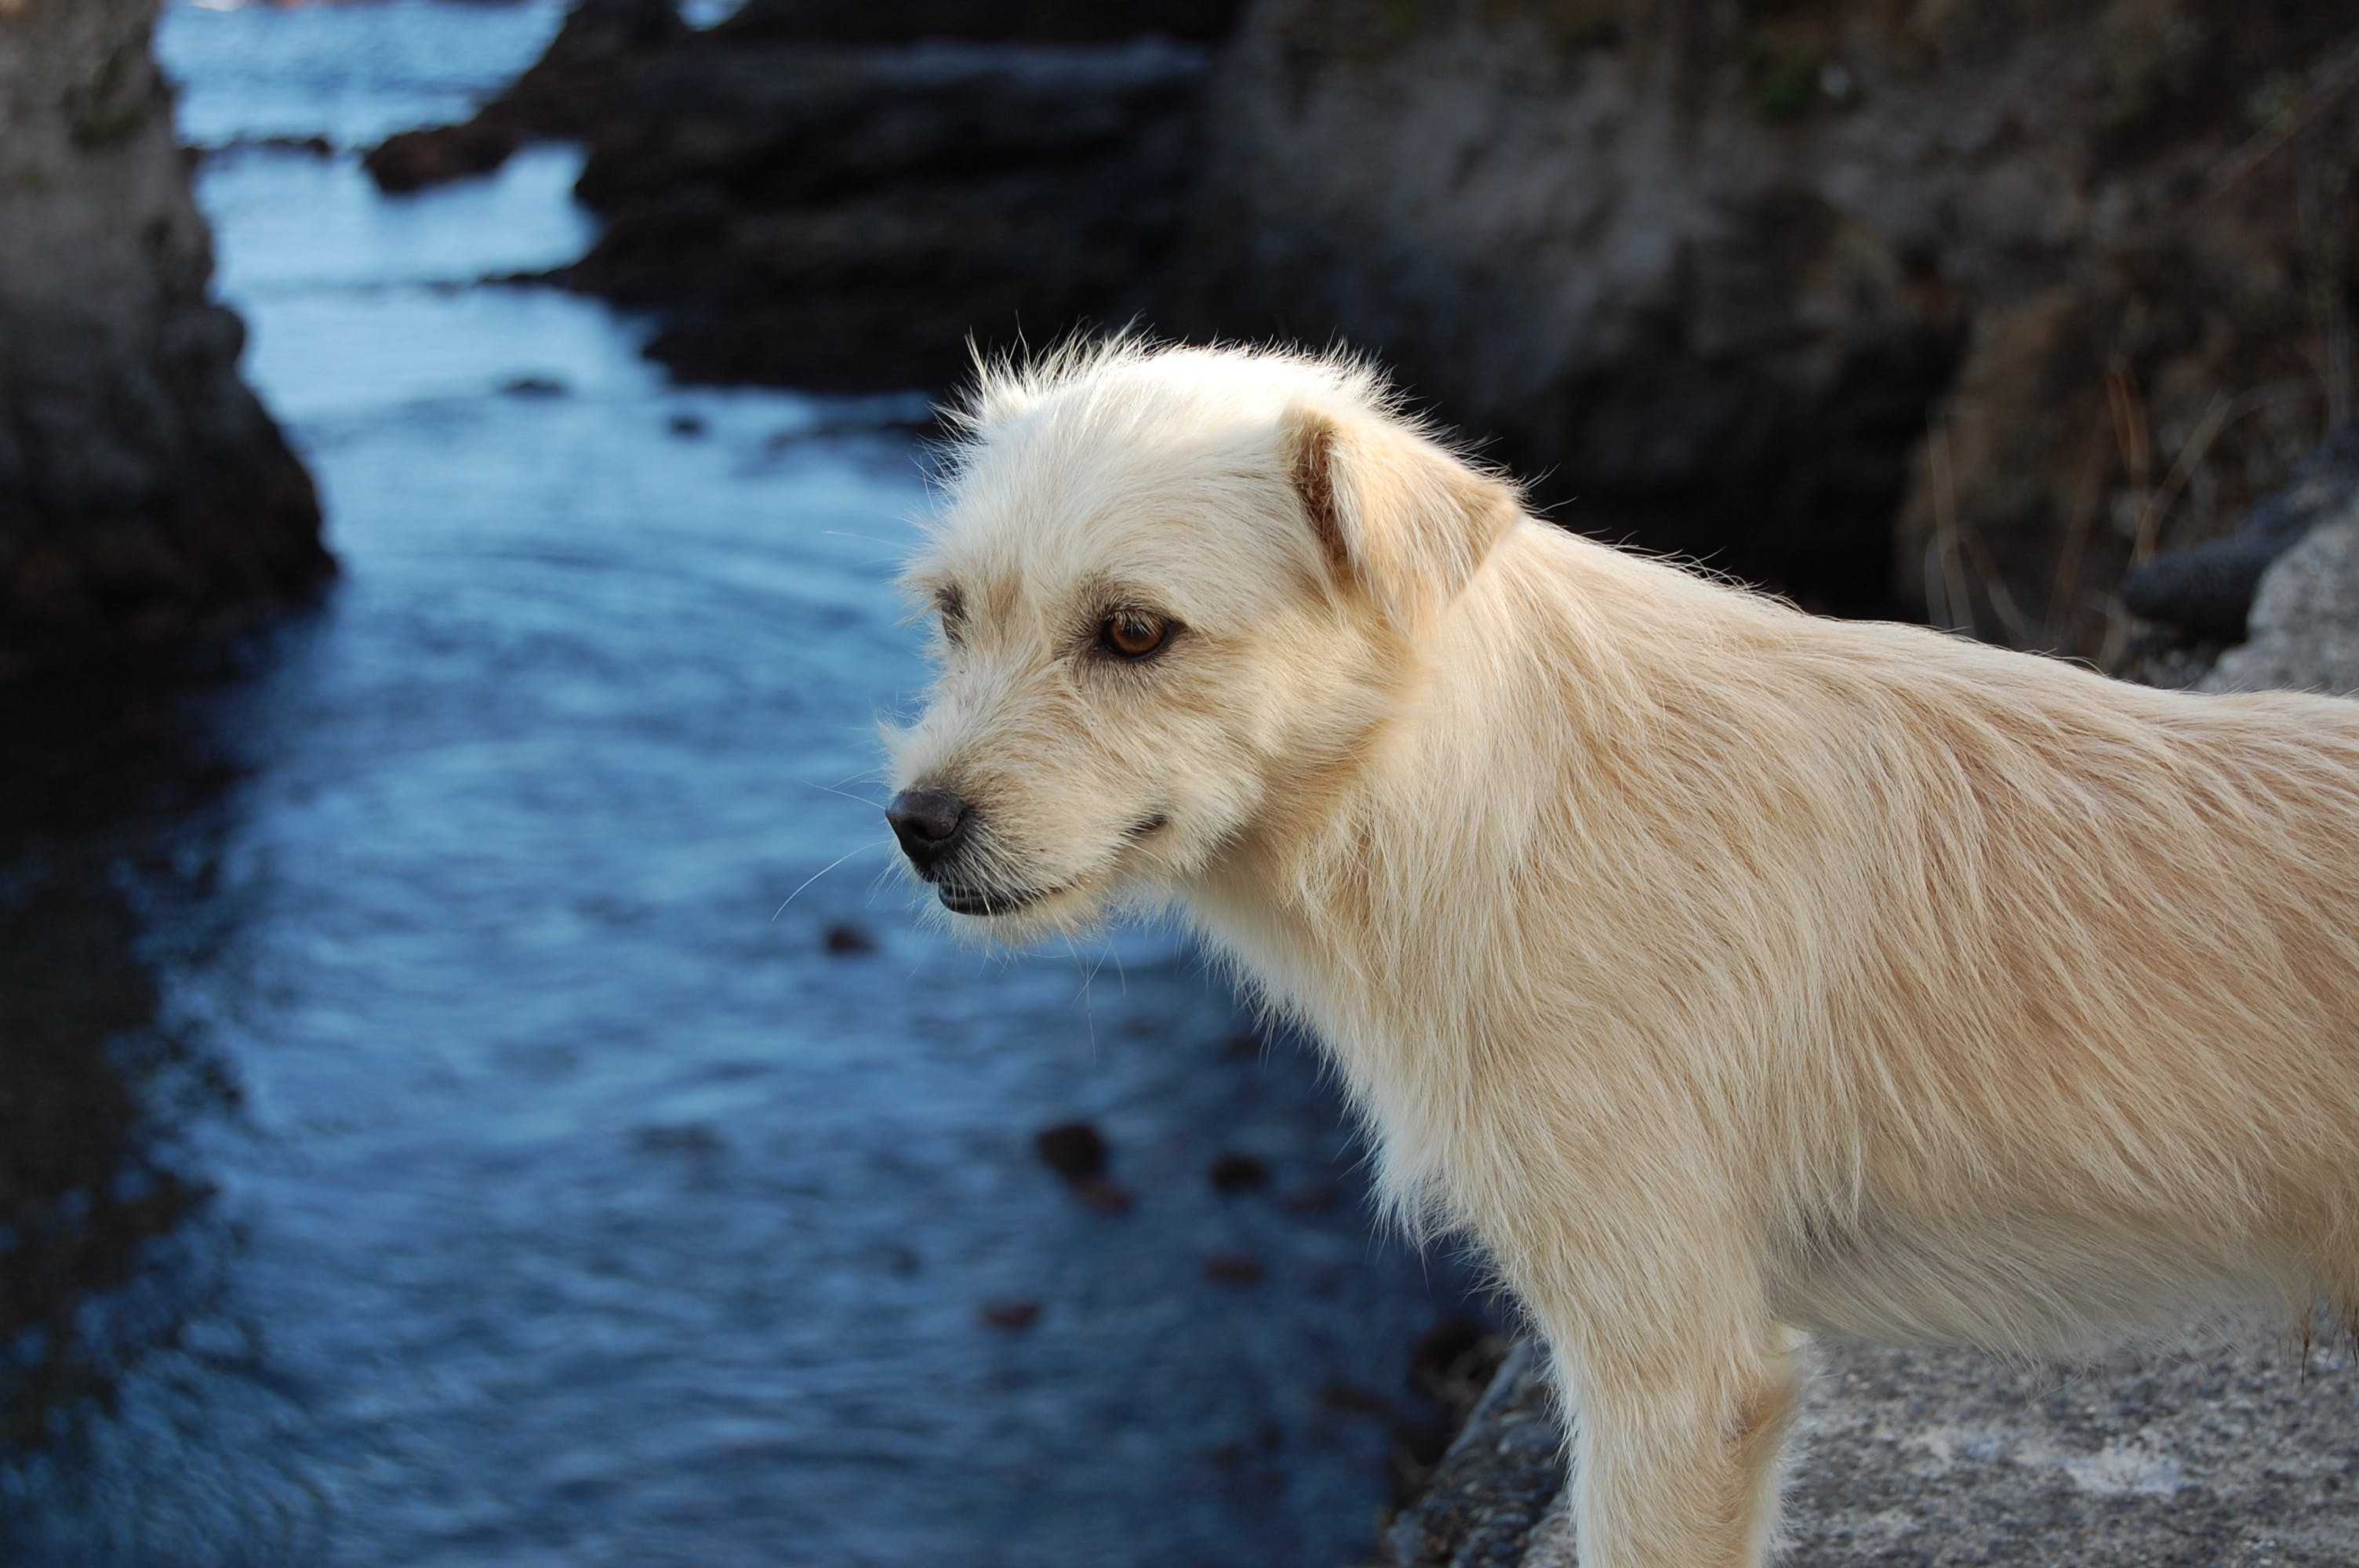 Fotos de stock gratuitas de agua, animal, canino, doméstico